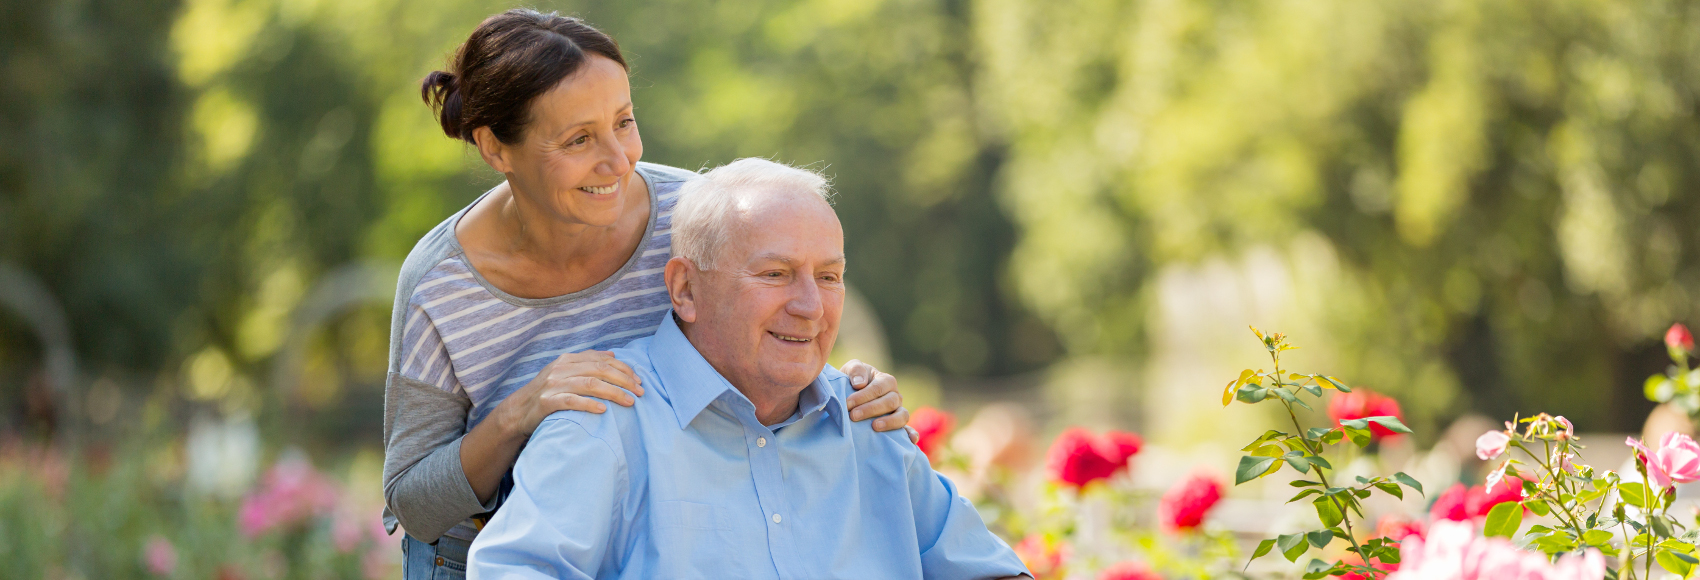 4.3-Caregiver-enews-Scale-1700